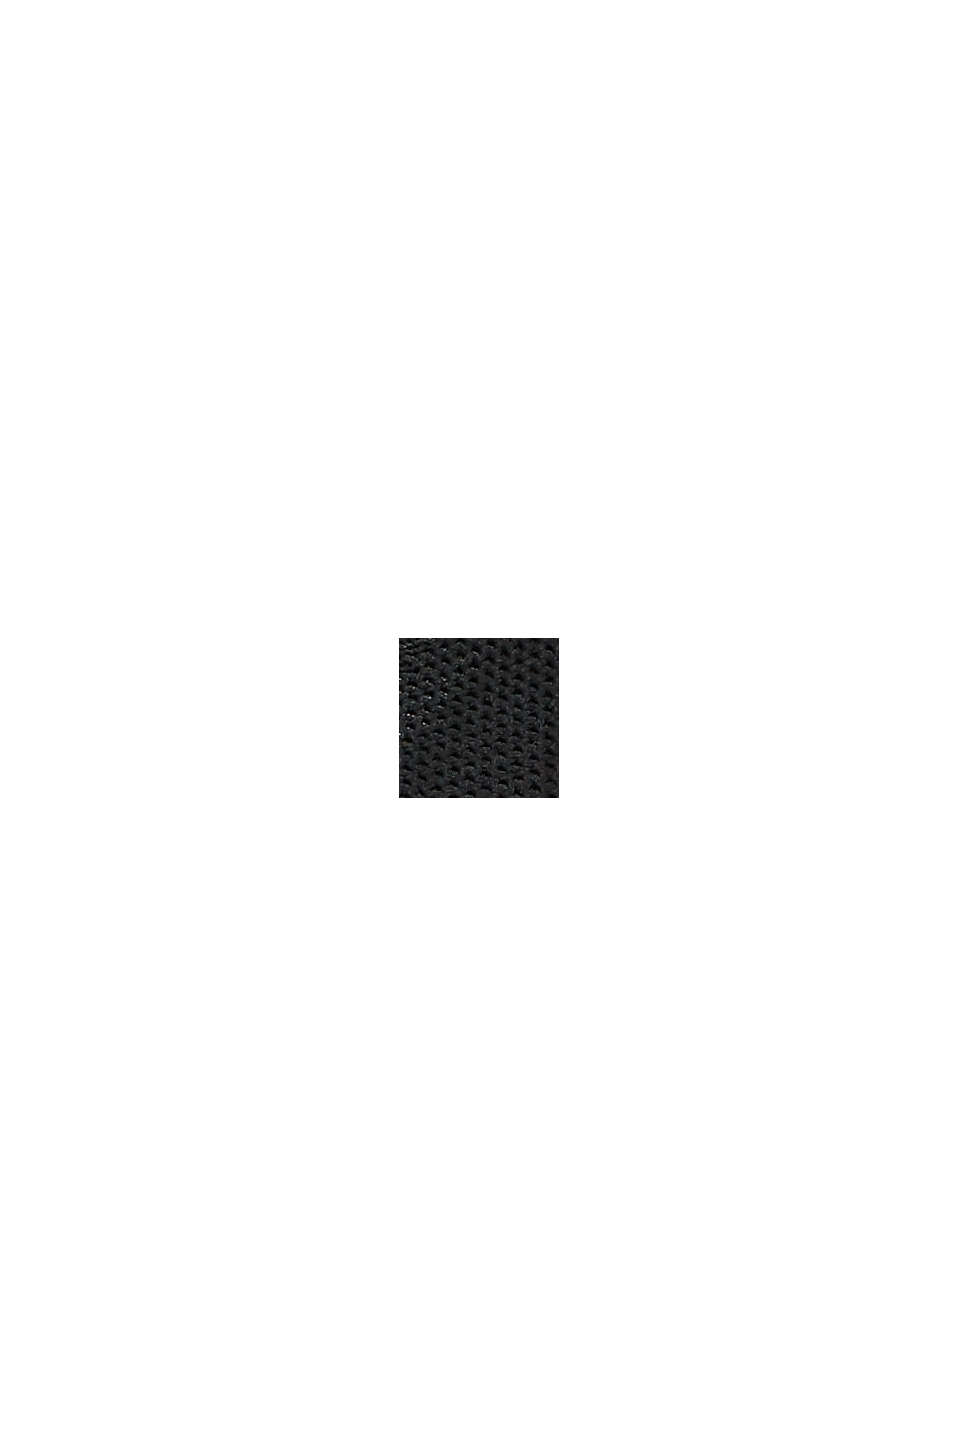 Sneakers en maille combinée, BLACK, swatch